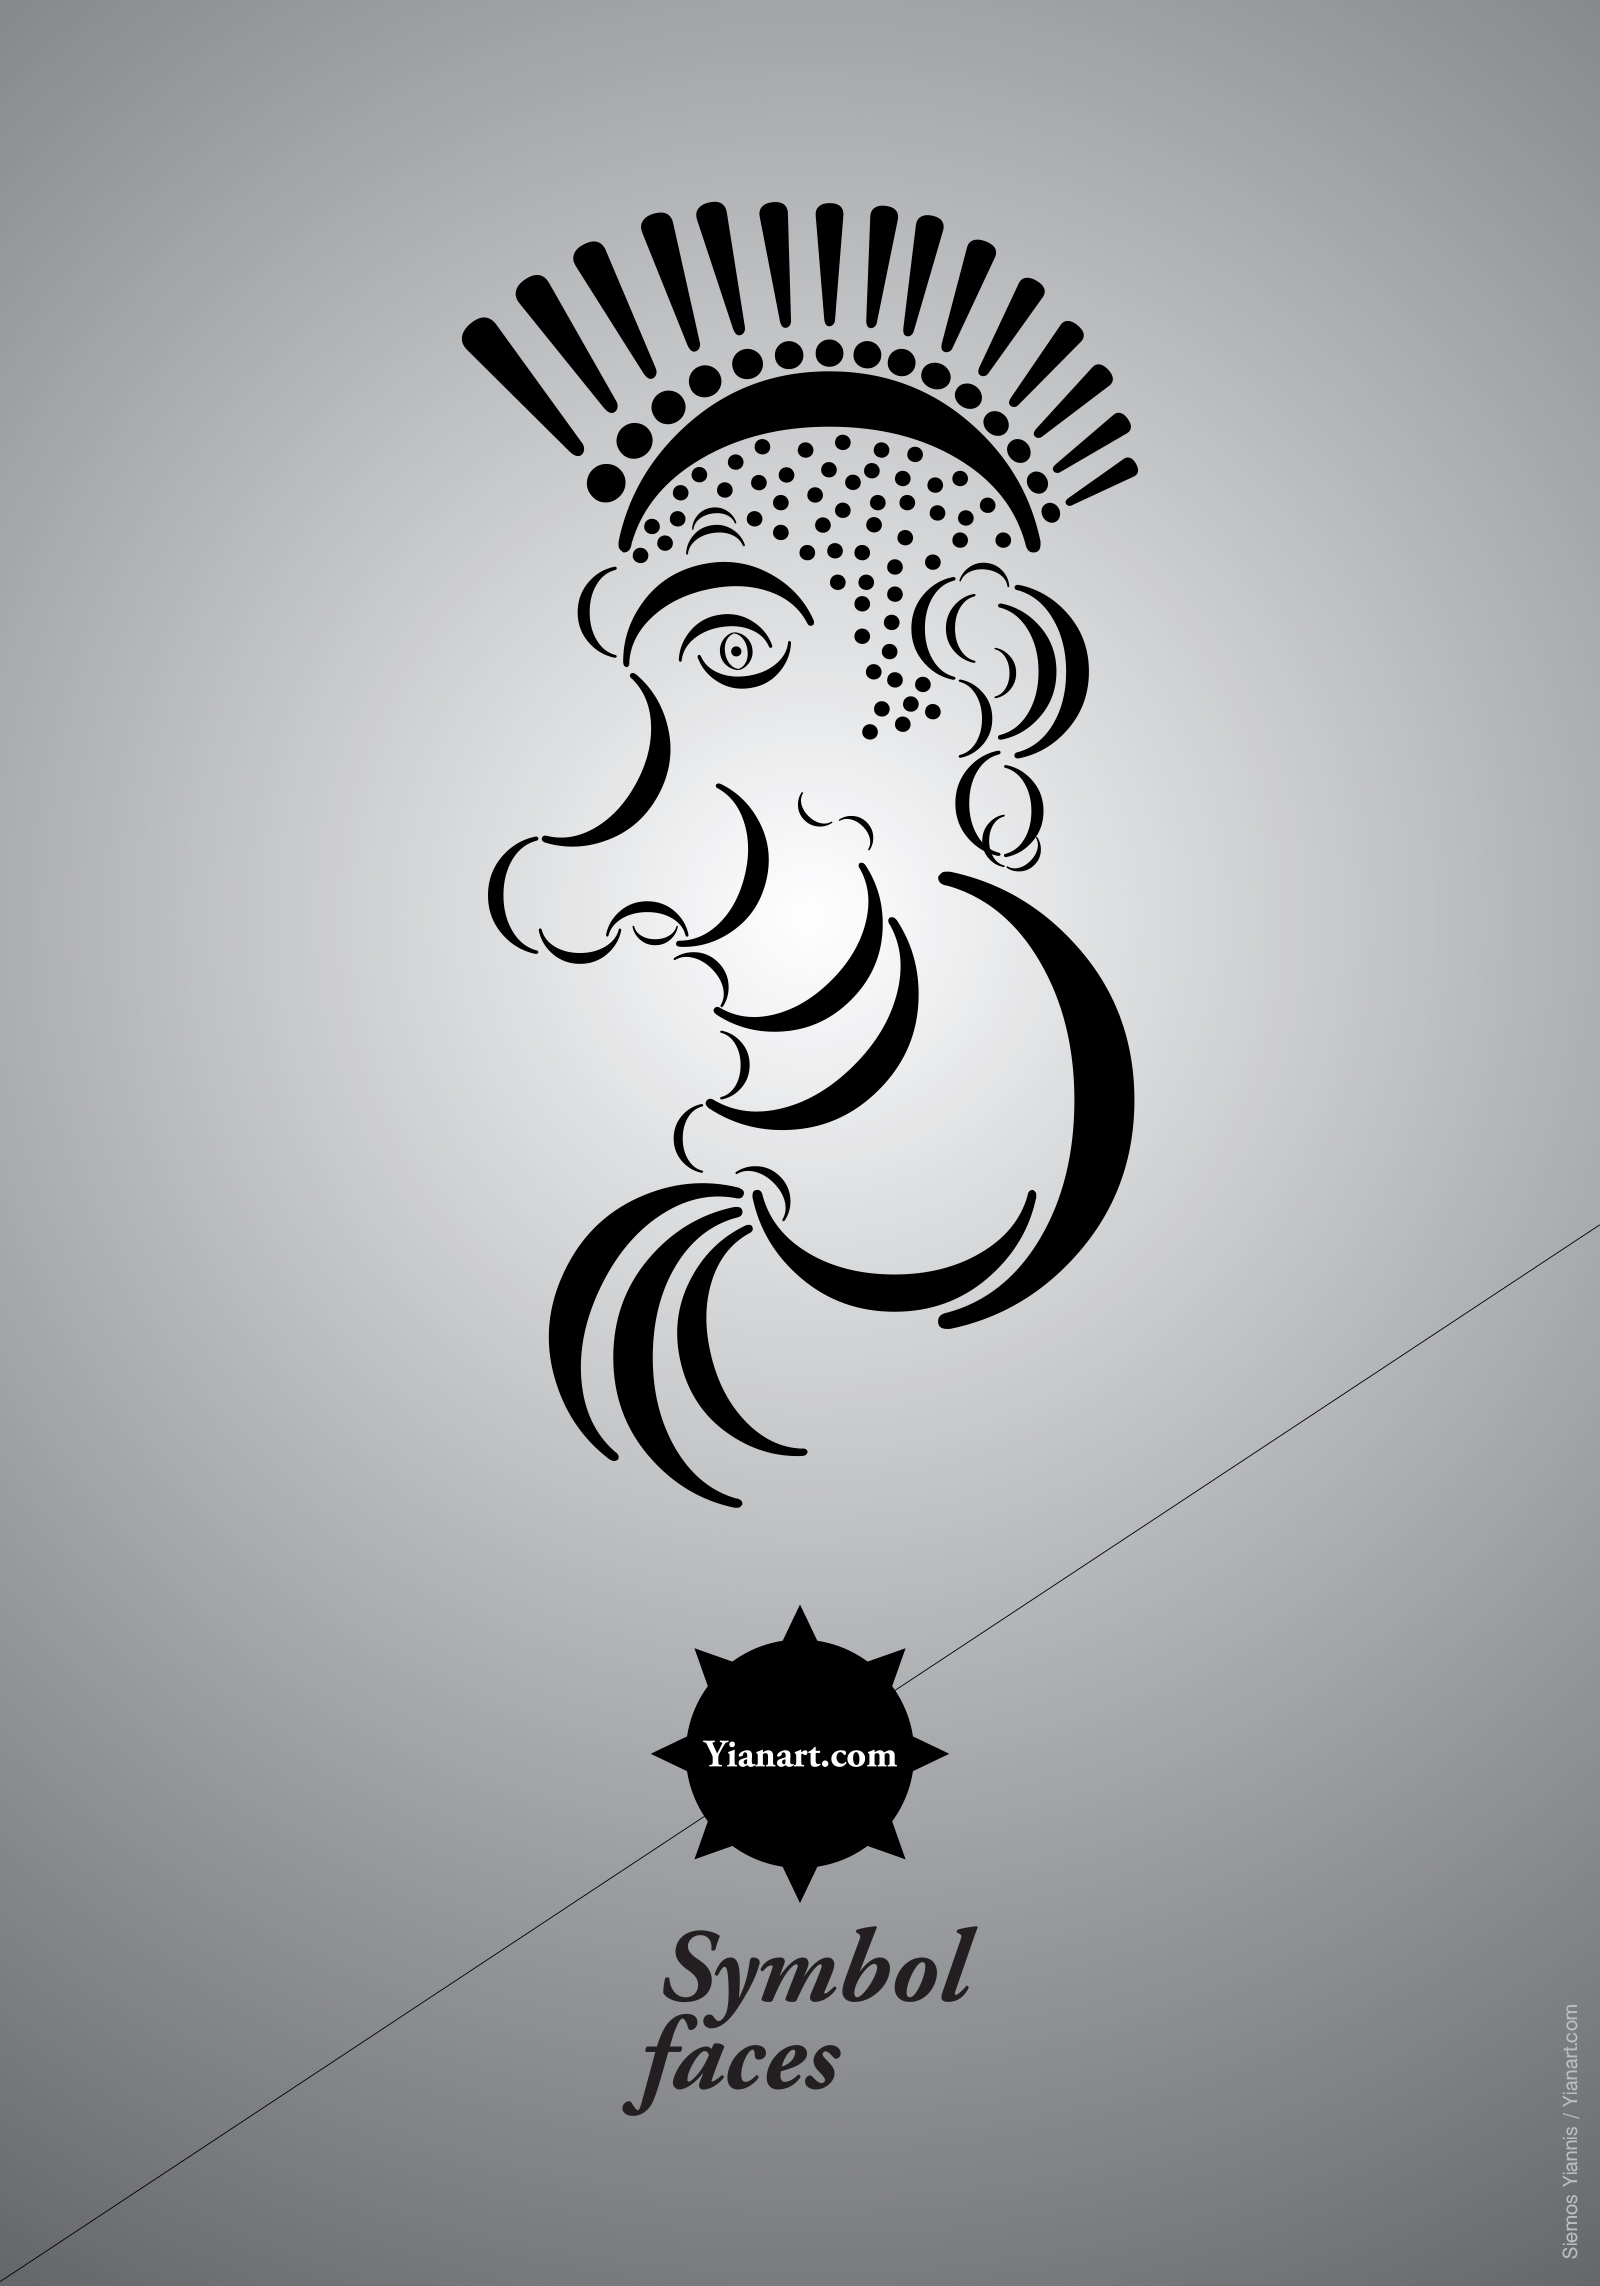 Symbol Faces_15_Yianart.com